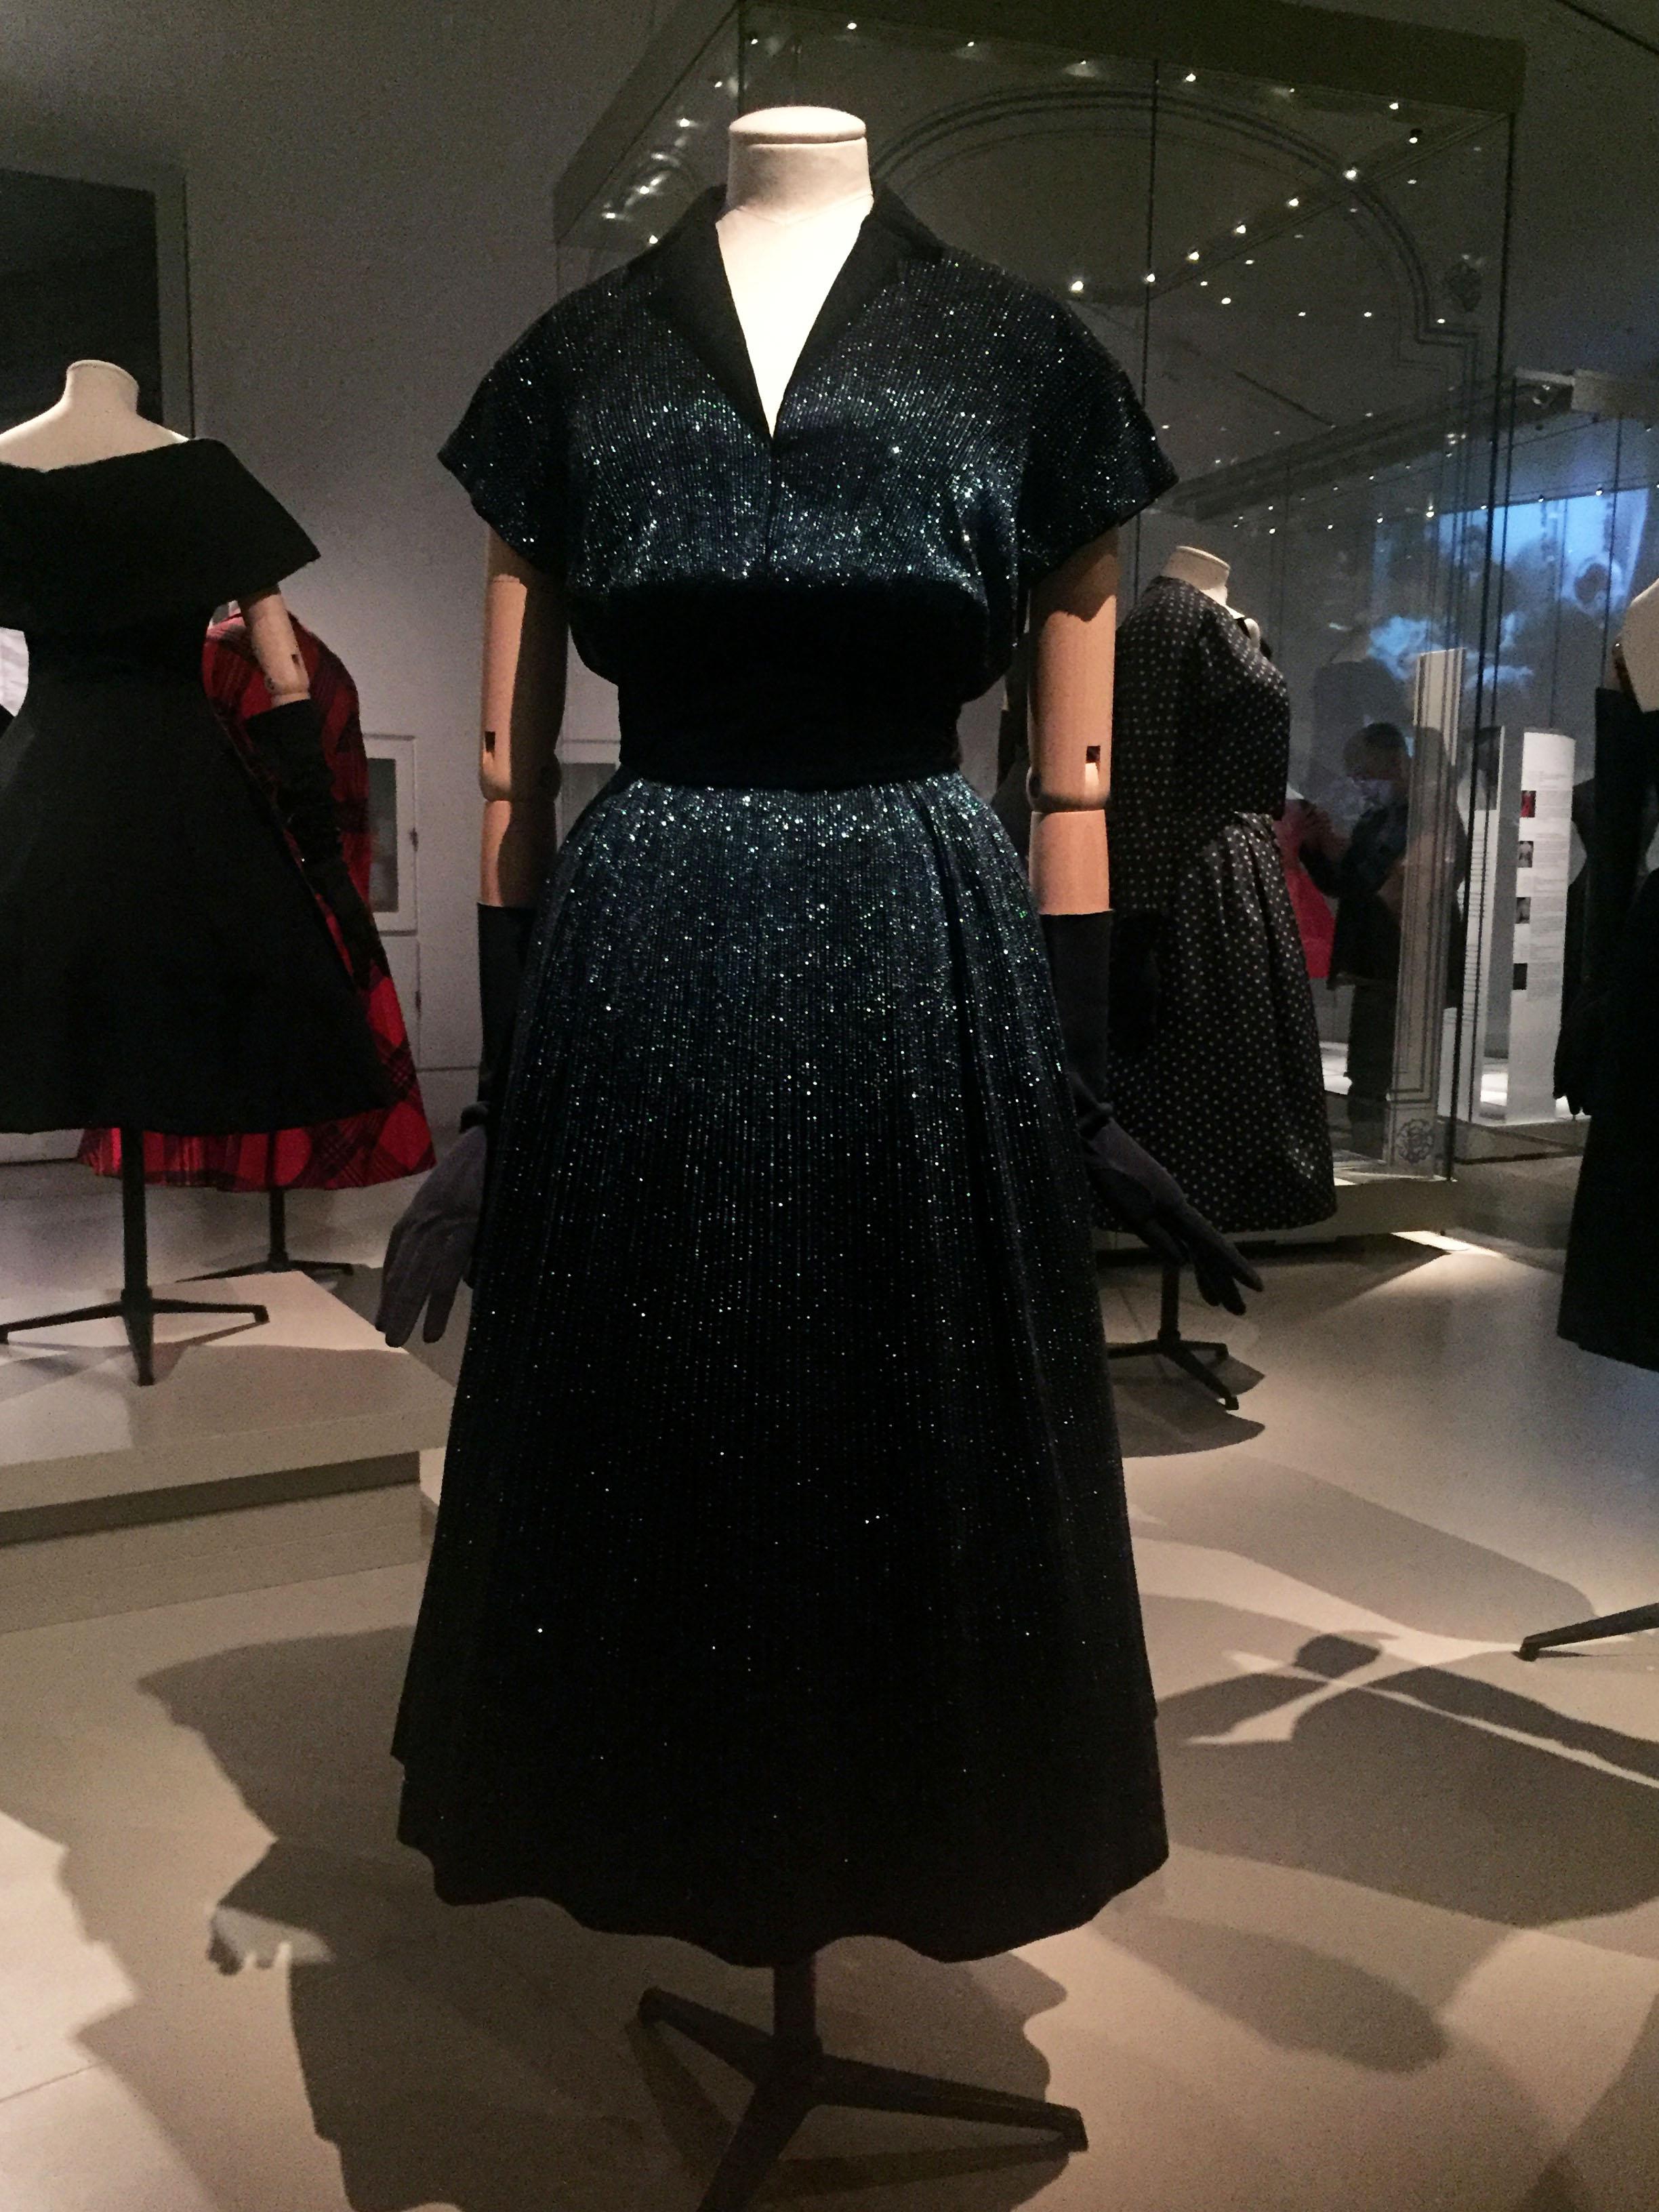 Dior Sparkly Blue Dress.jpg